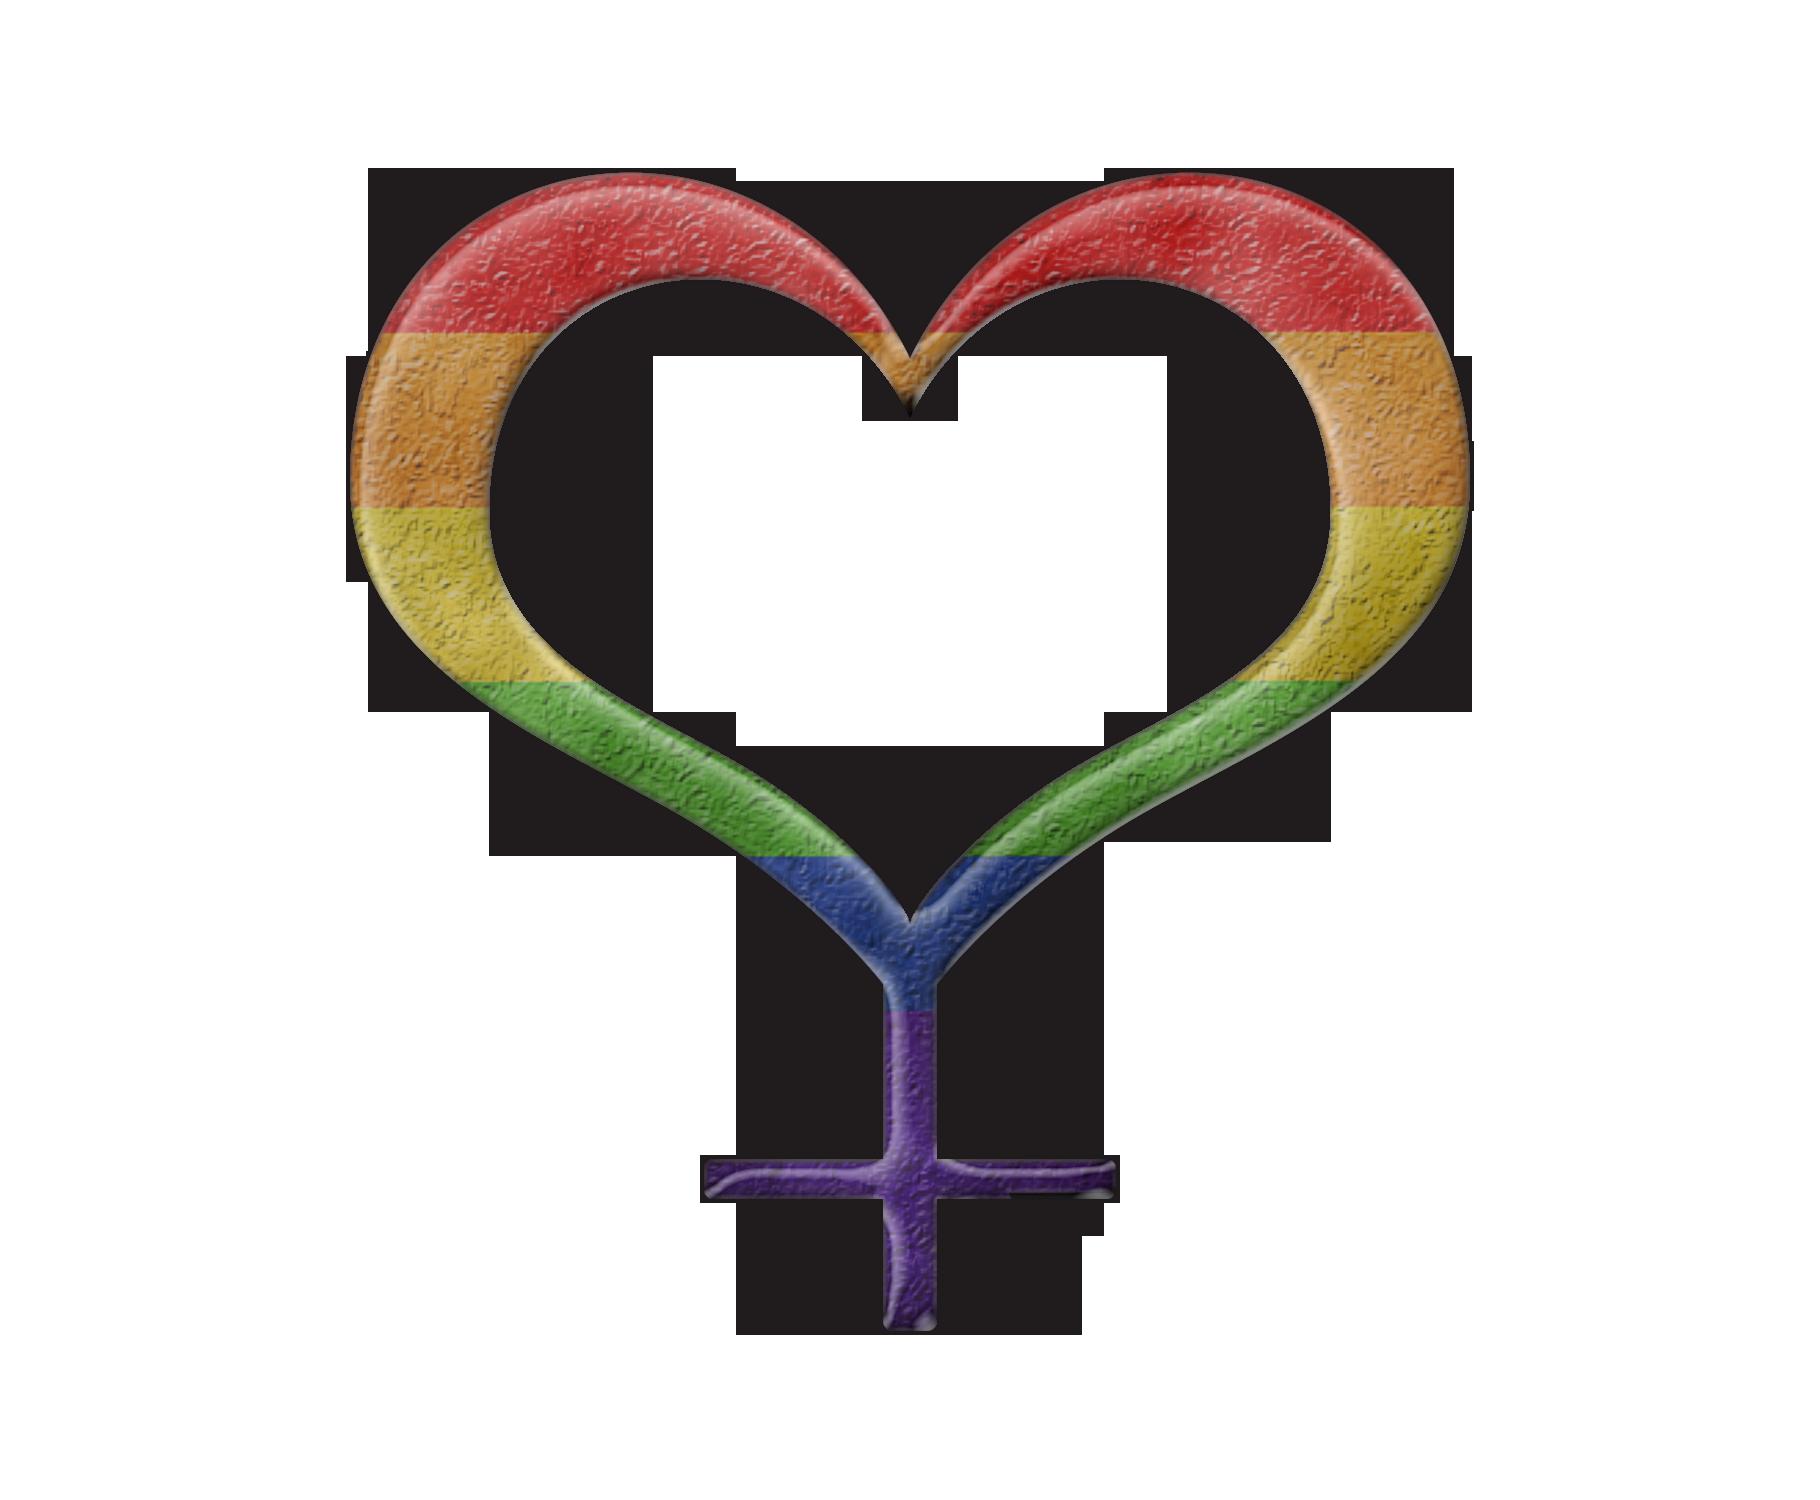 Lesbian pride design rainbow colored heart shaped female gender rainbow colored heart shaped female gender symbol heart shaped female gender buycottarizona